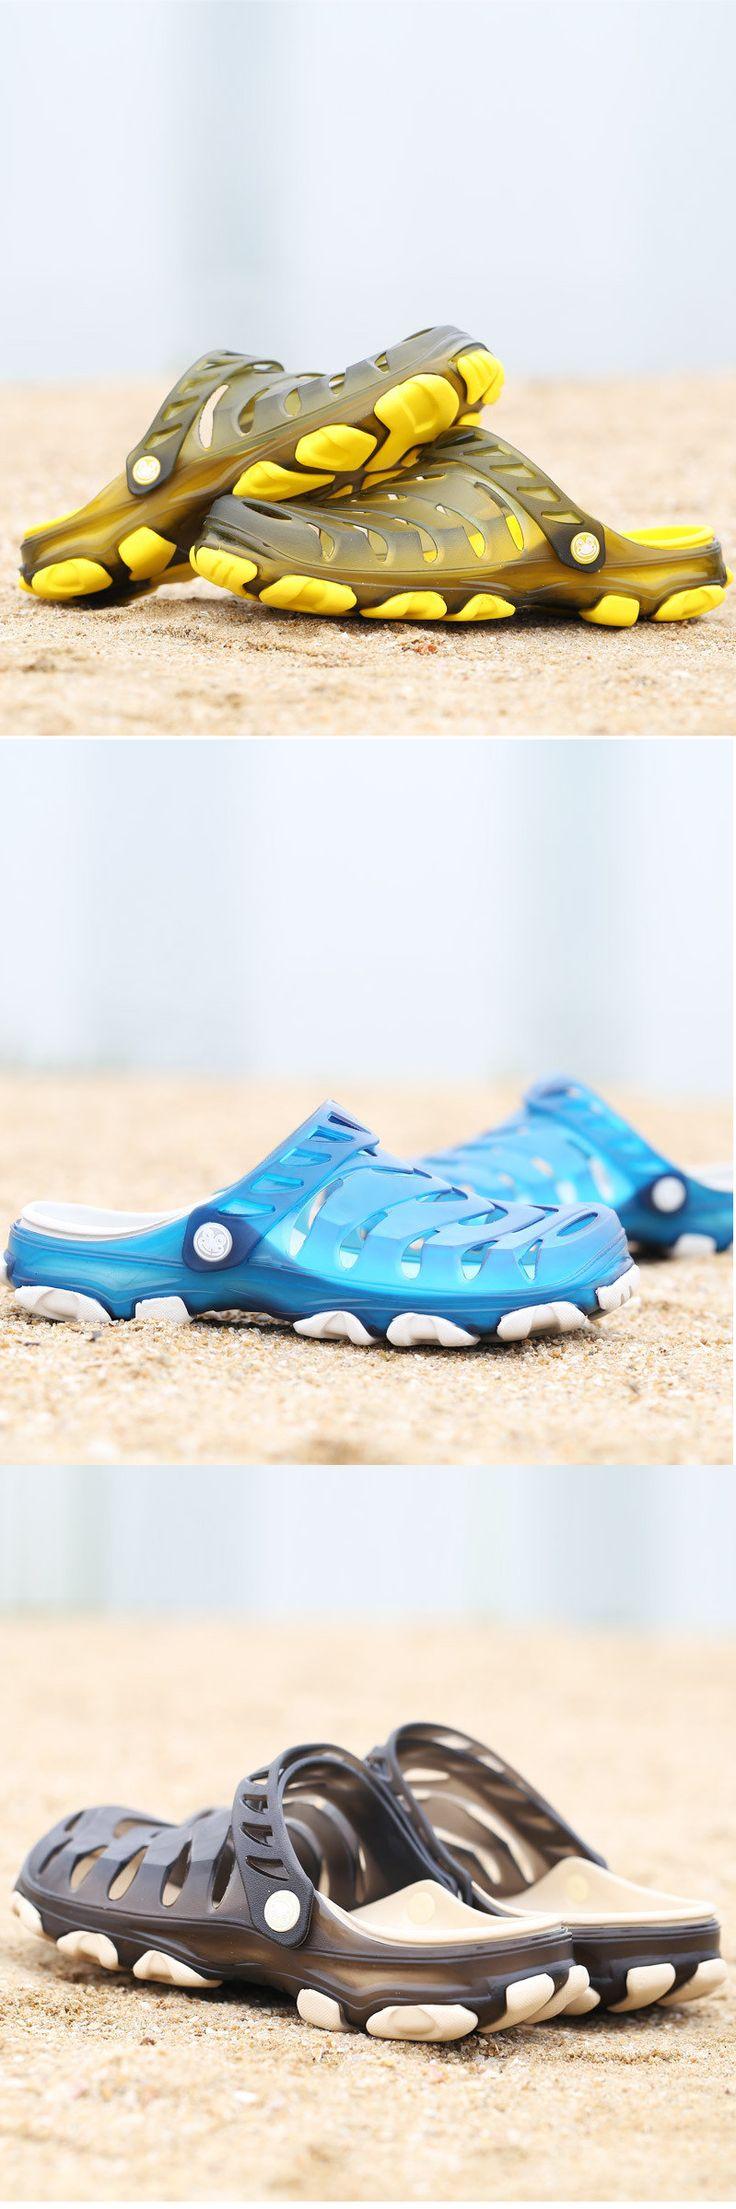 US$17.60 Men Hole Breathable Soft Beach Sandals Light Waterproof Shoes